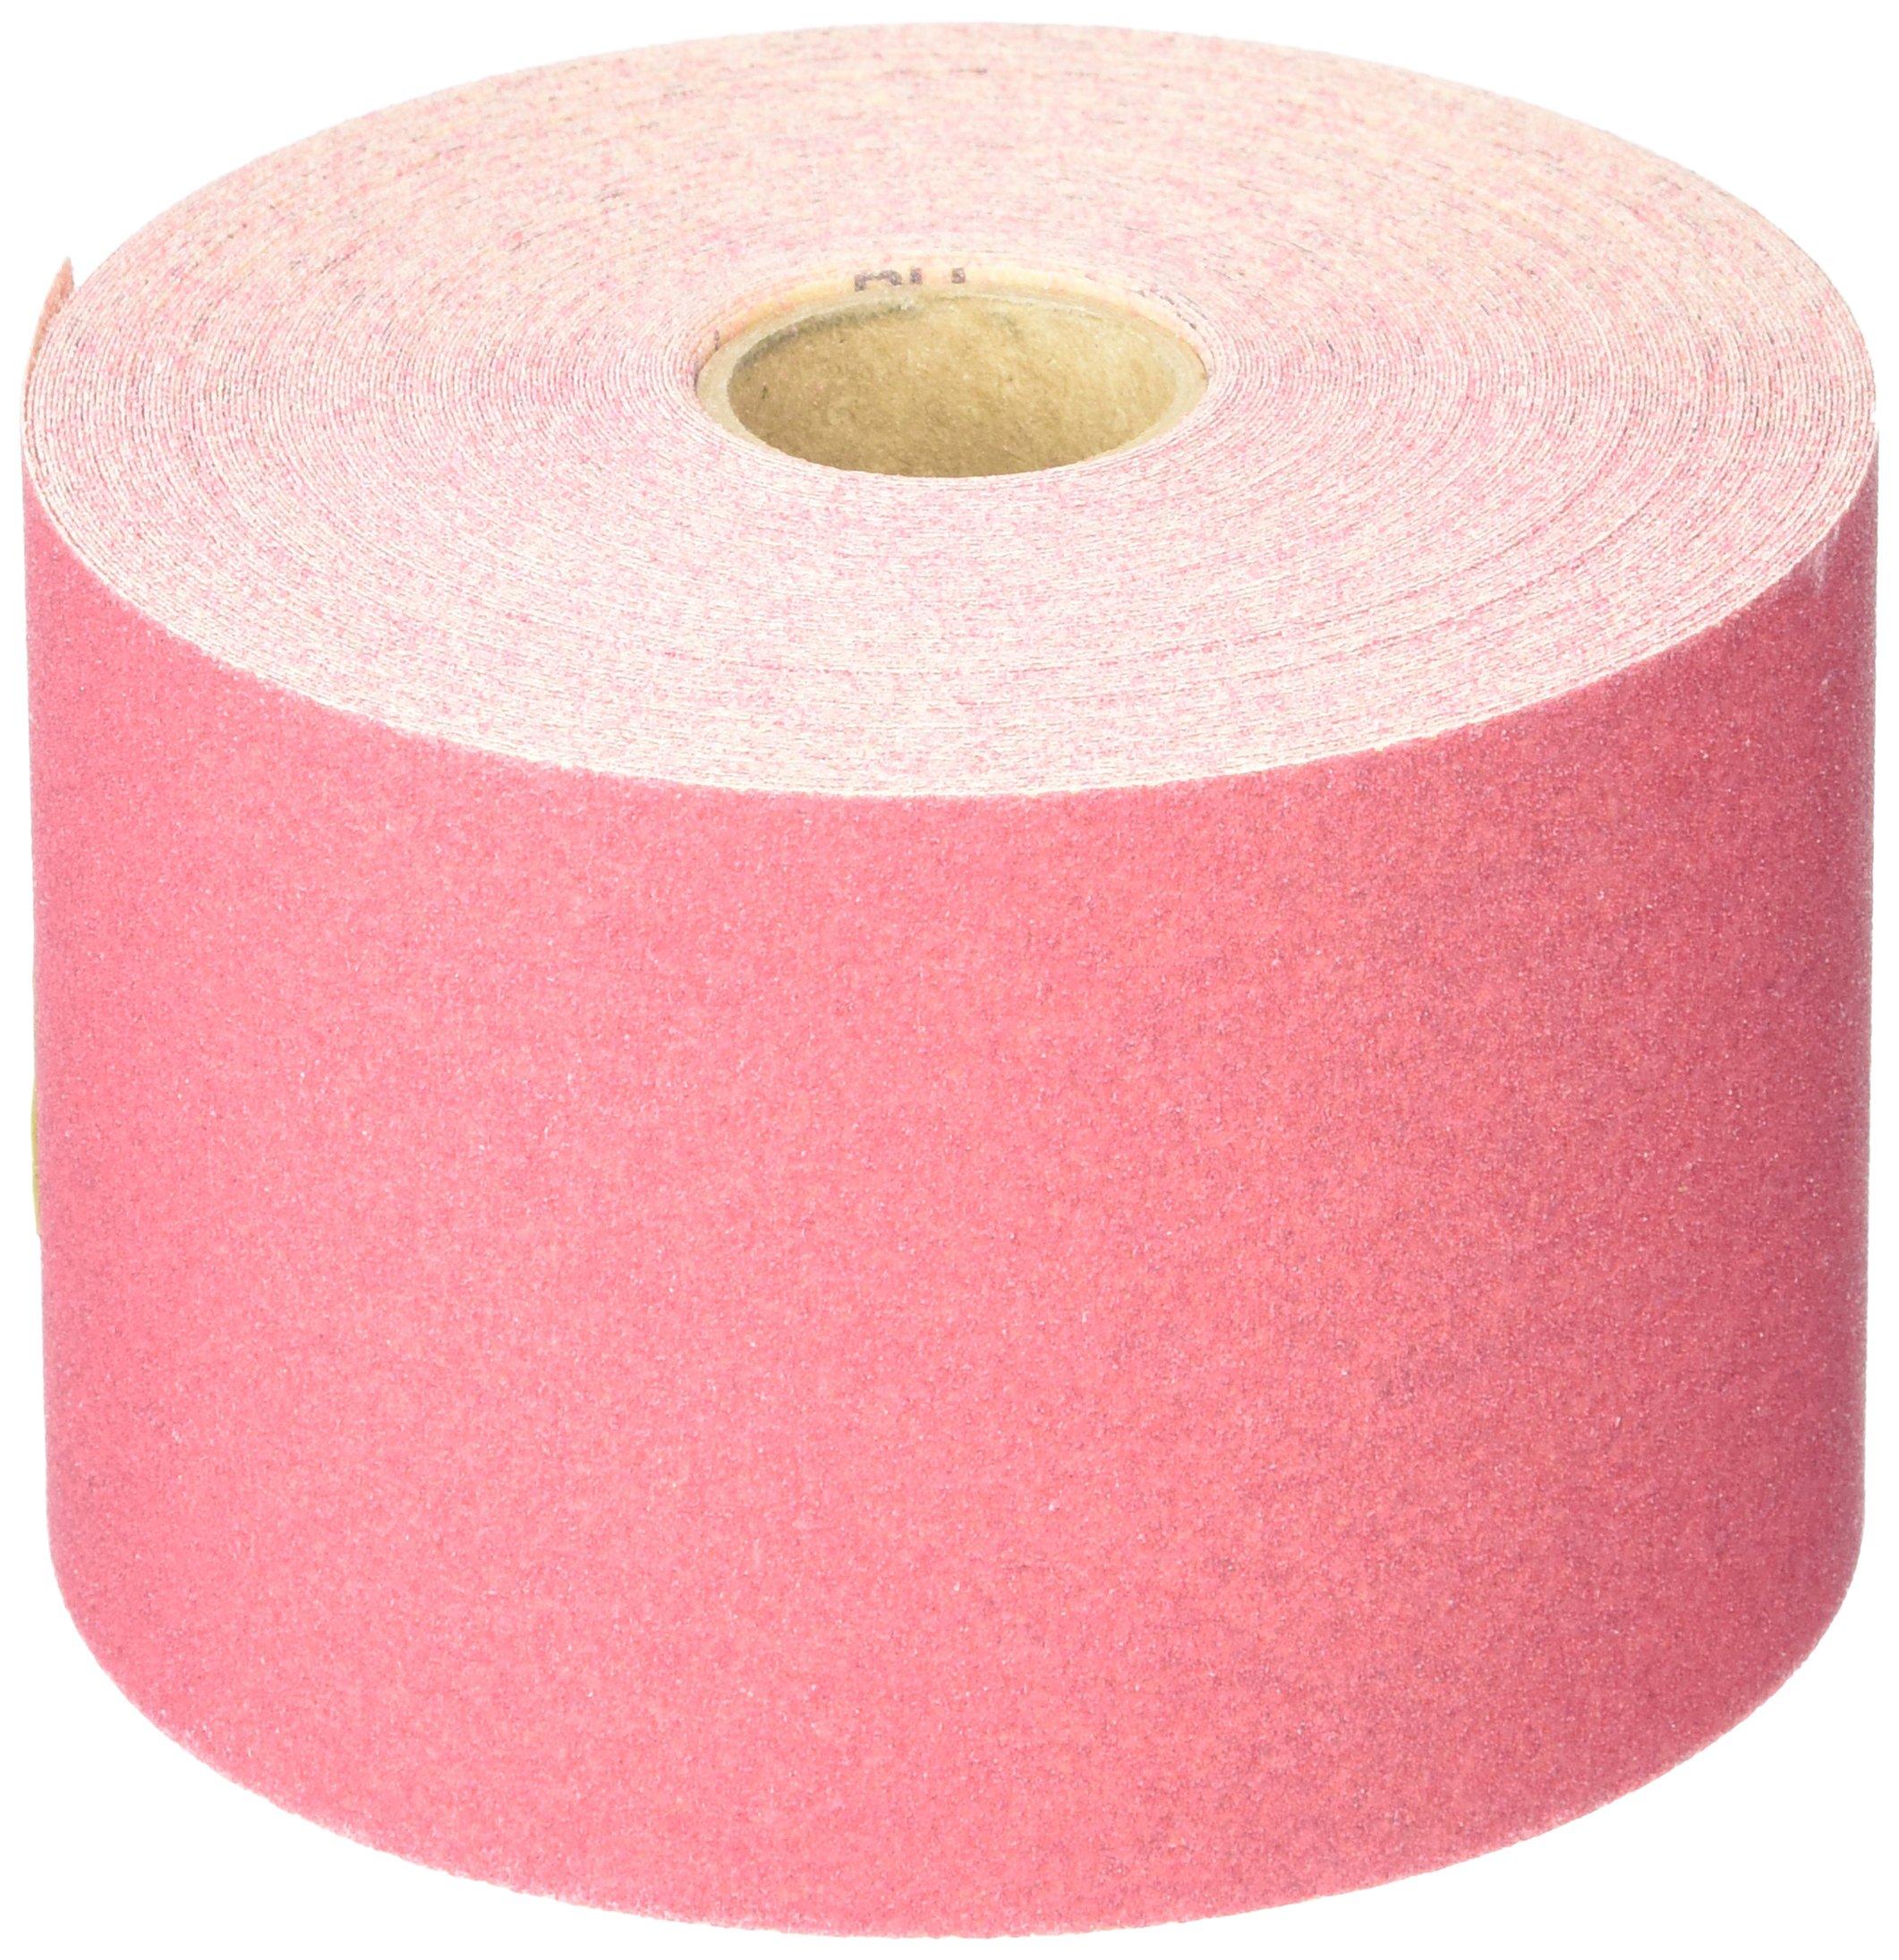 3M 01686 Stikit Red 2-3/4'' x 25 Yard P150 Grit Abrasive Sheet Roll